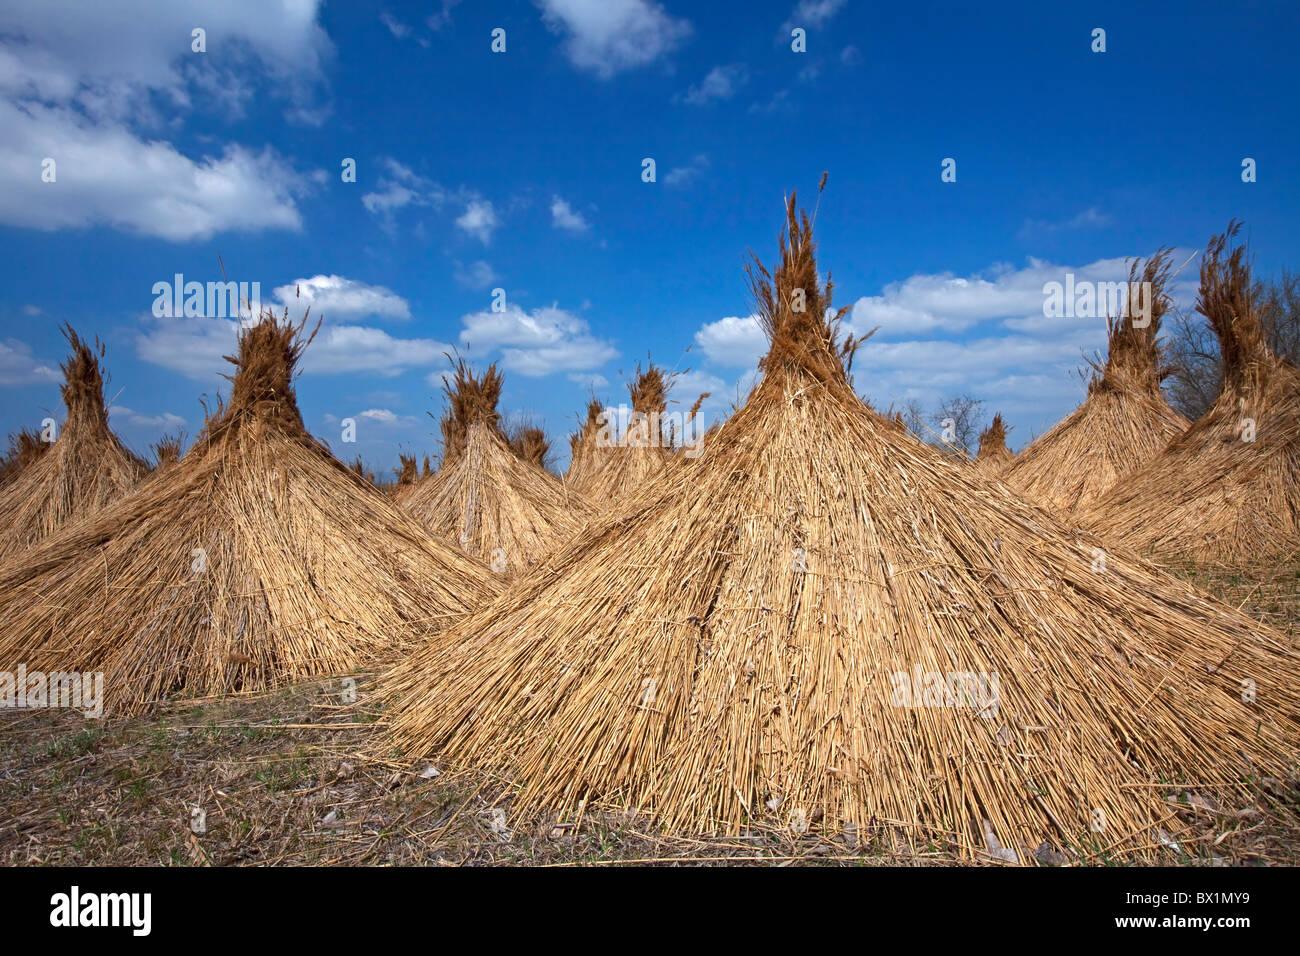 Common Reed (Phragmites australis / Phragmites communis) harvested bundles drying at Neusiedler Lake, Austria - Stock Image